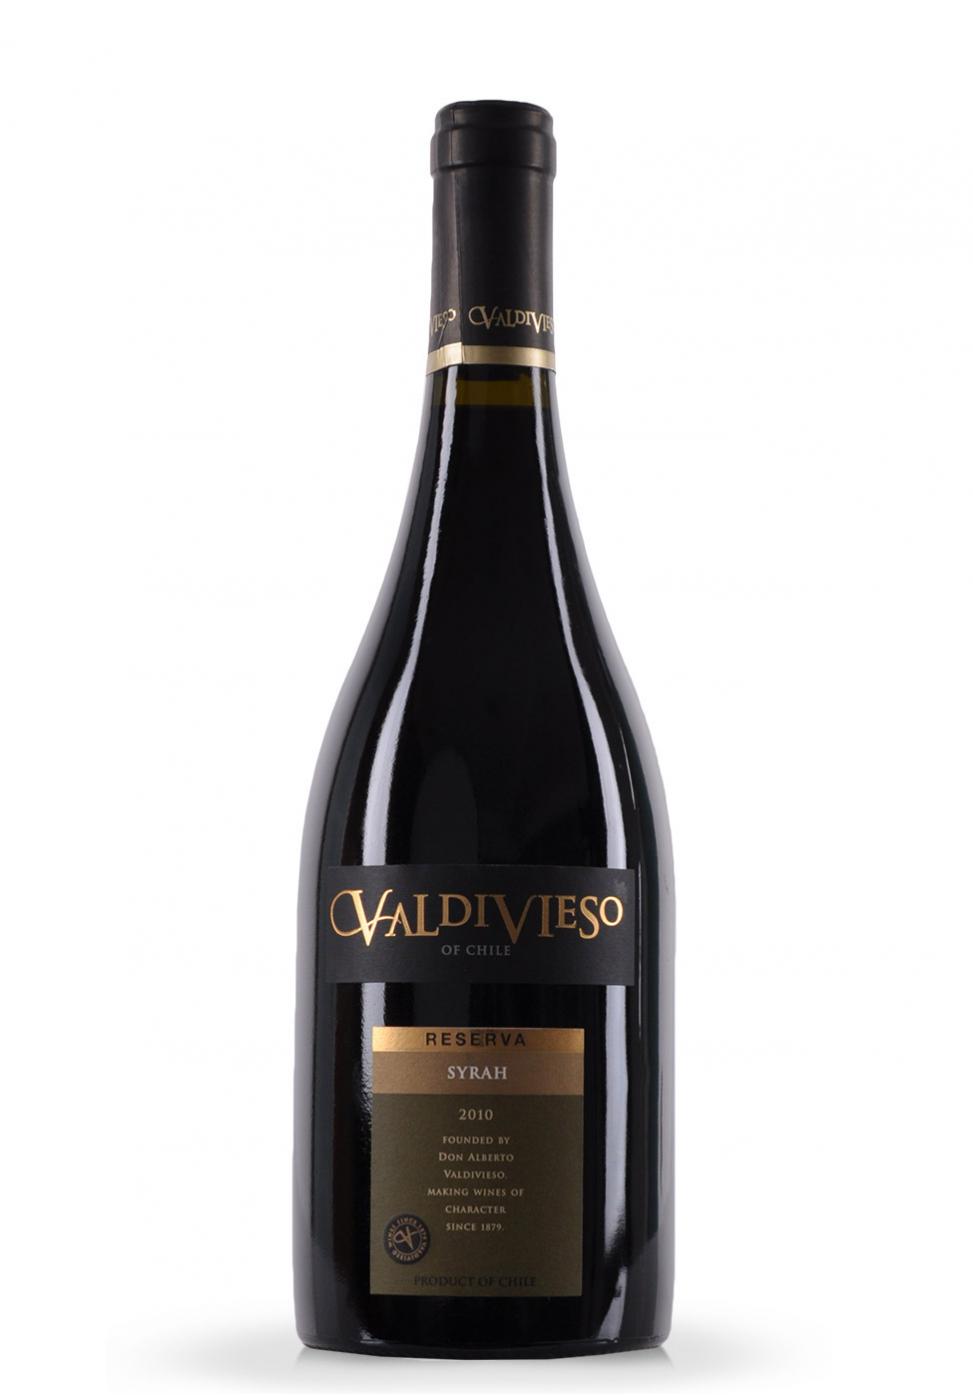 Vin Valdivieso, Syrah Reserva, 2010 (0.75L)